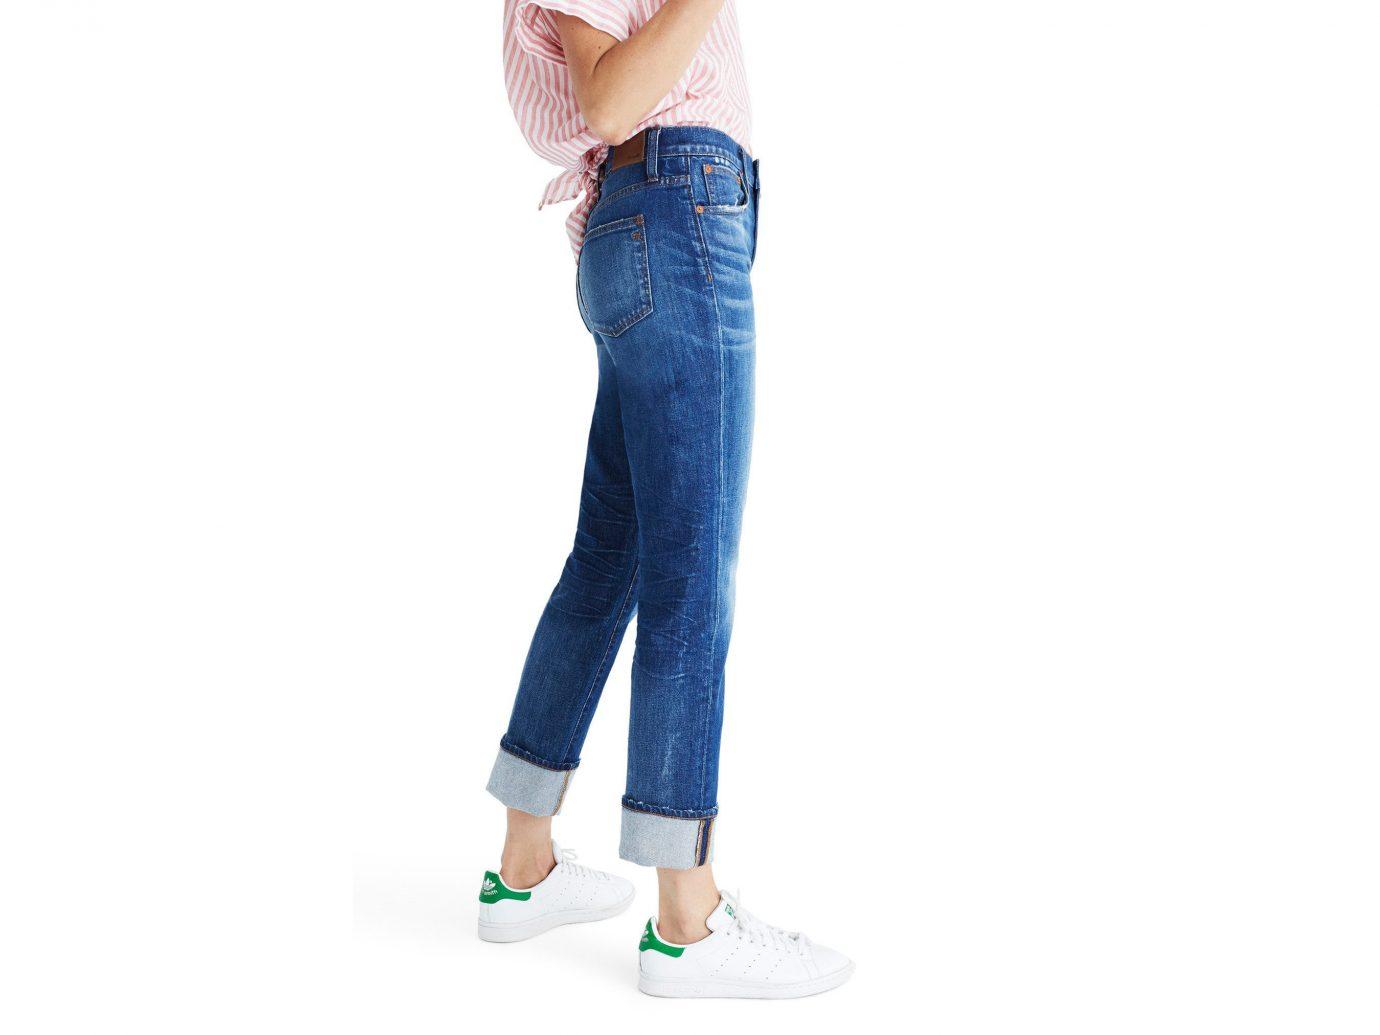 Style + Design person jeans denim standing wearing electric blue waist joint trousers human leg trouser shoe abdomen